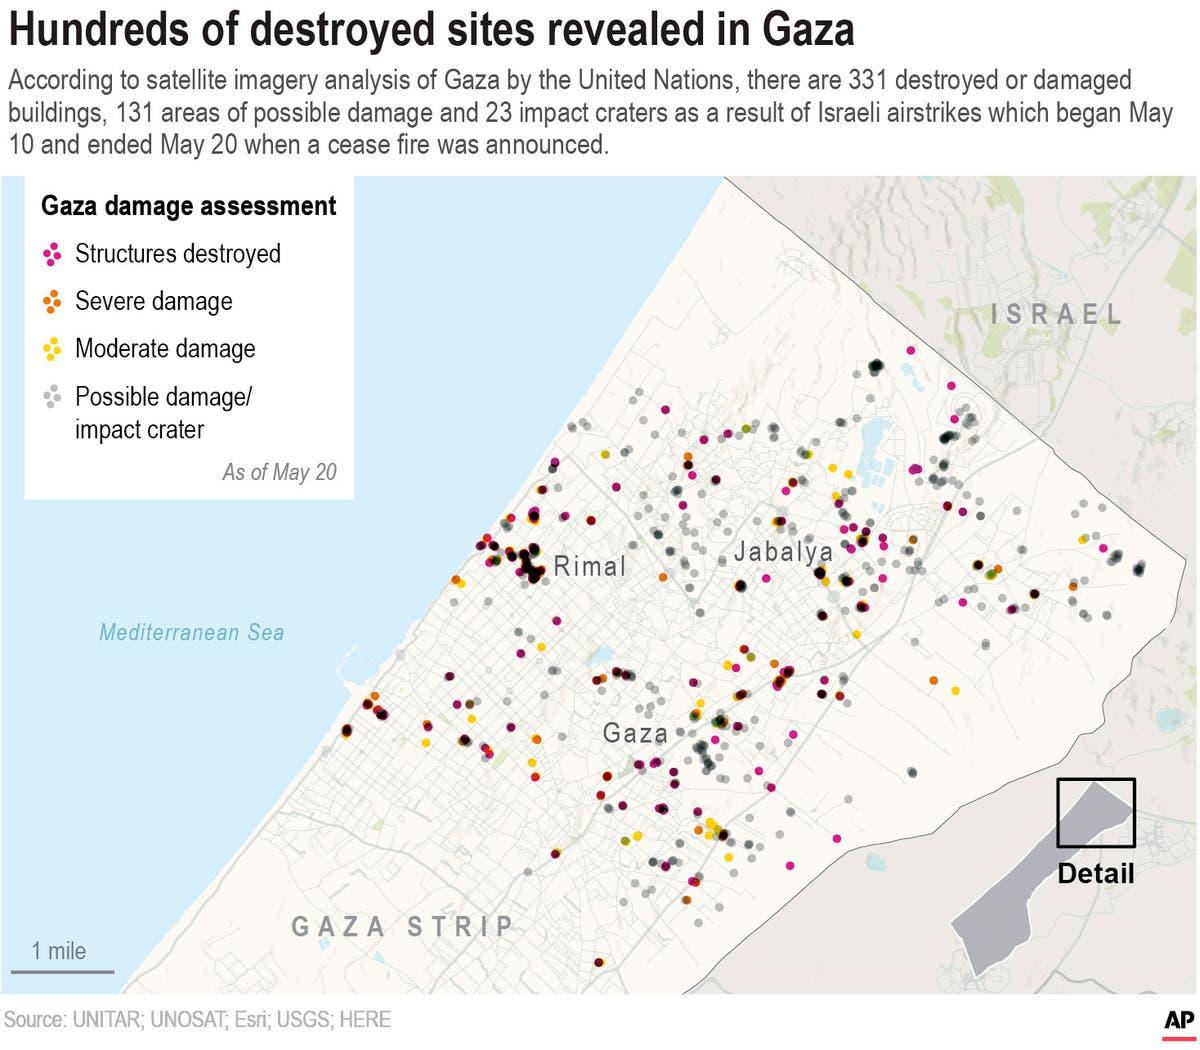 Israël, Egypt talk truce with Hamas, rebuilding Gaza Strip